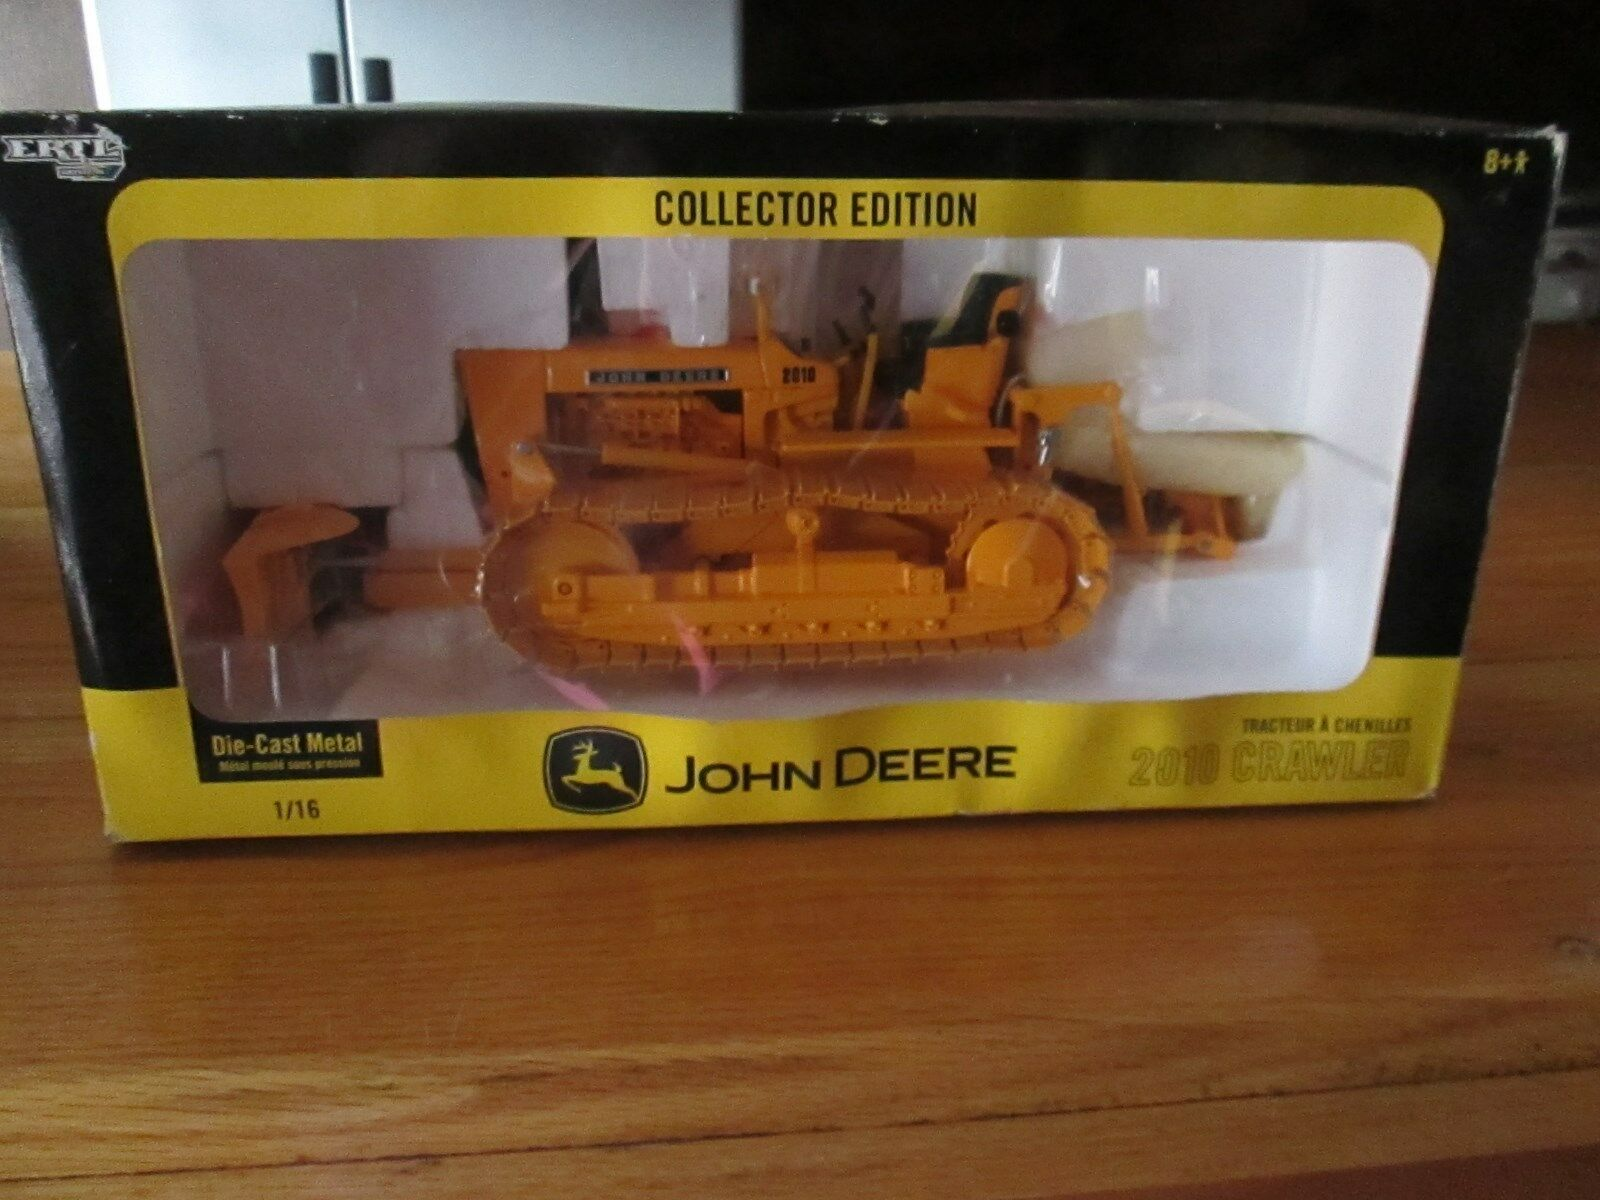 C28 ERTL John Deere 2010 Crawler collector edition diecast 1 16 New in Box 15472 A